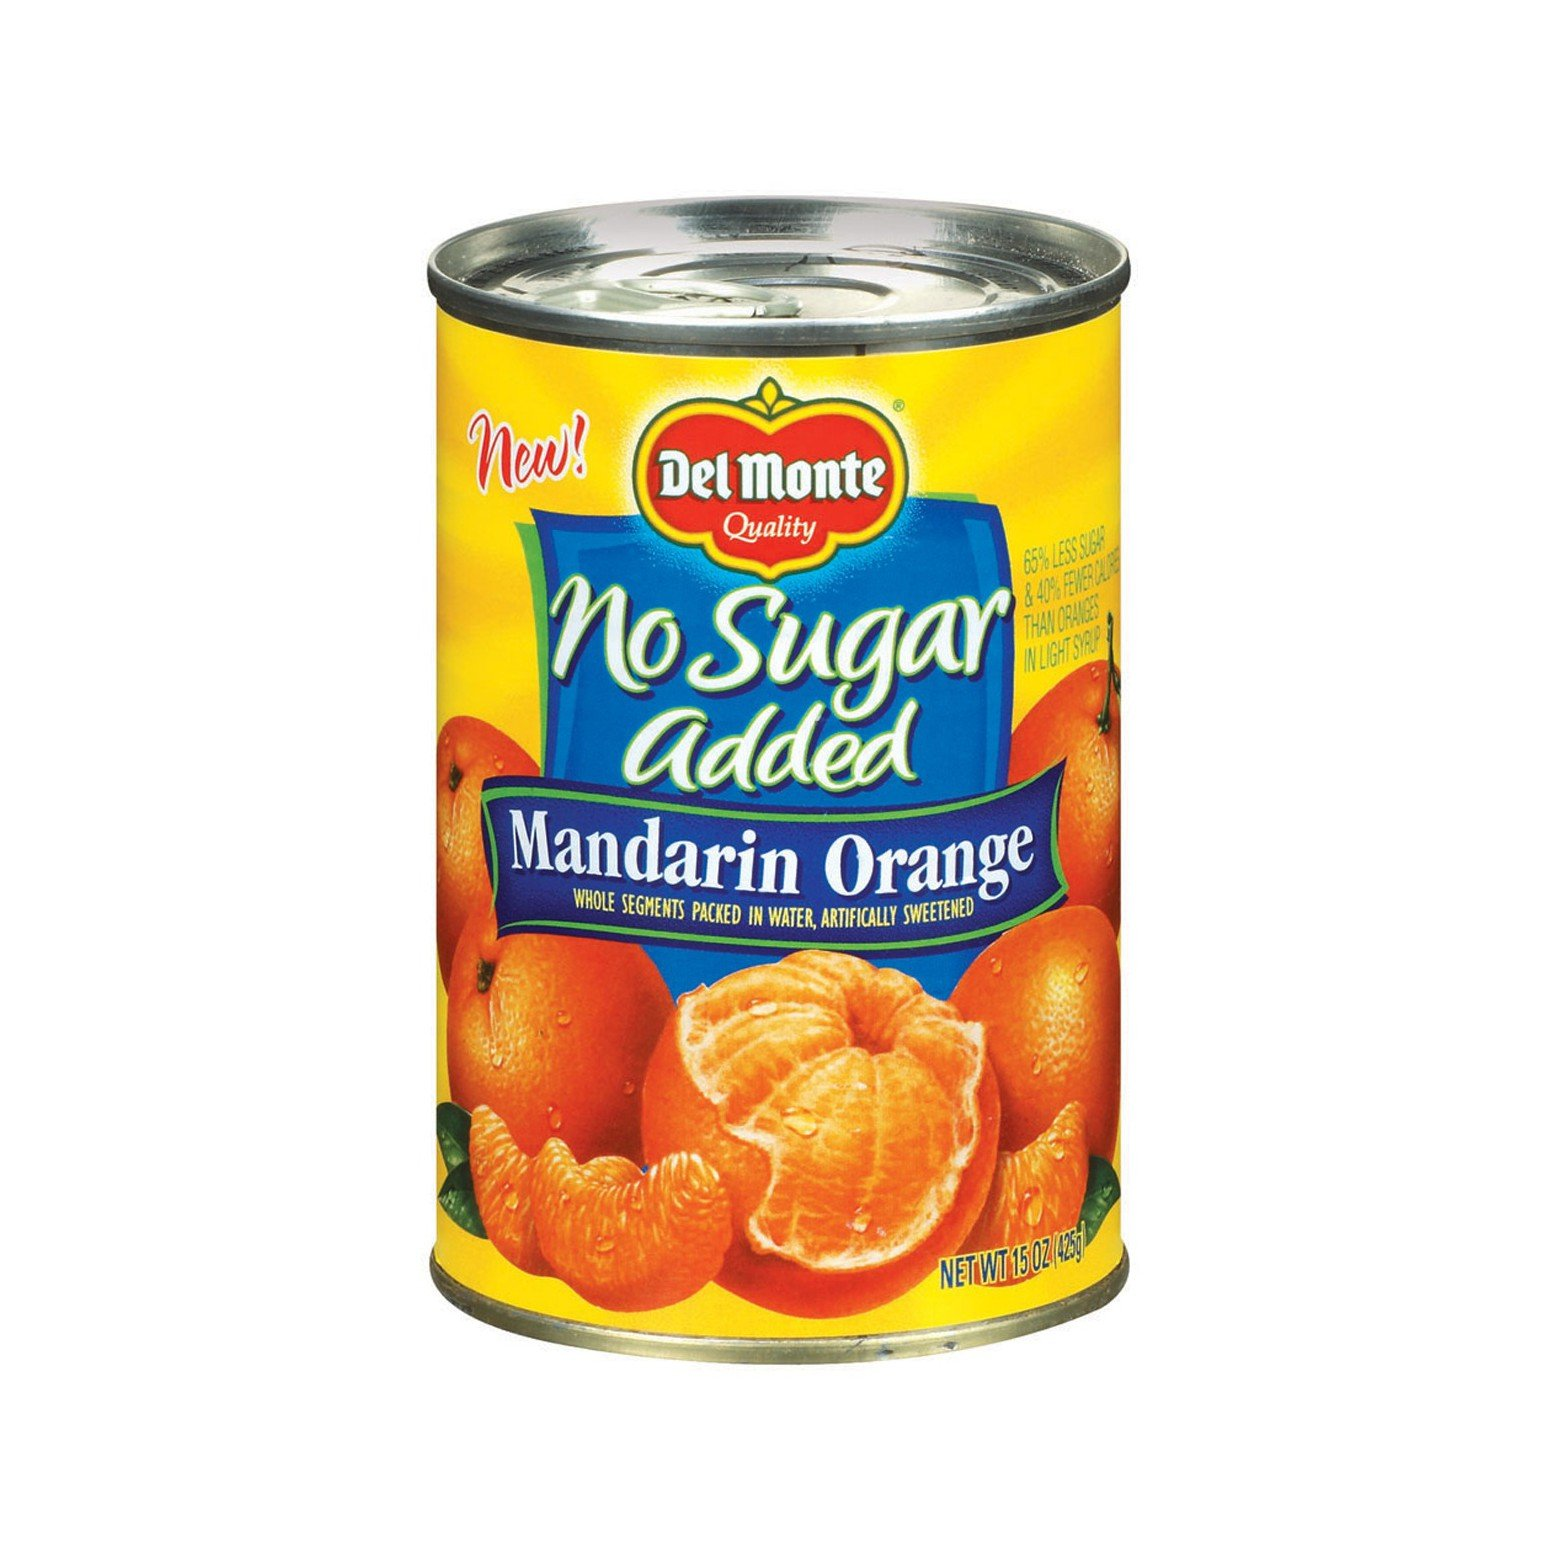 Del Monte No Sugar Added Mandarin Oranges in Water 15 oz (3 Pack)